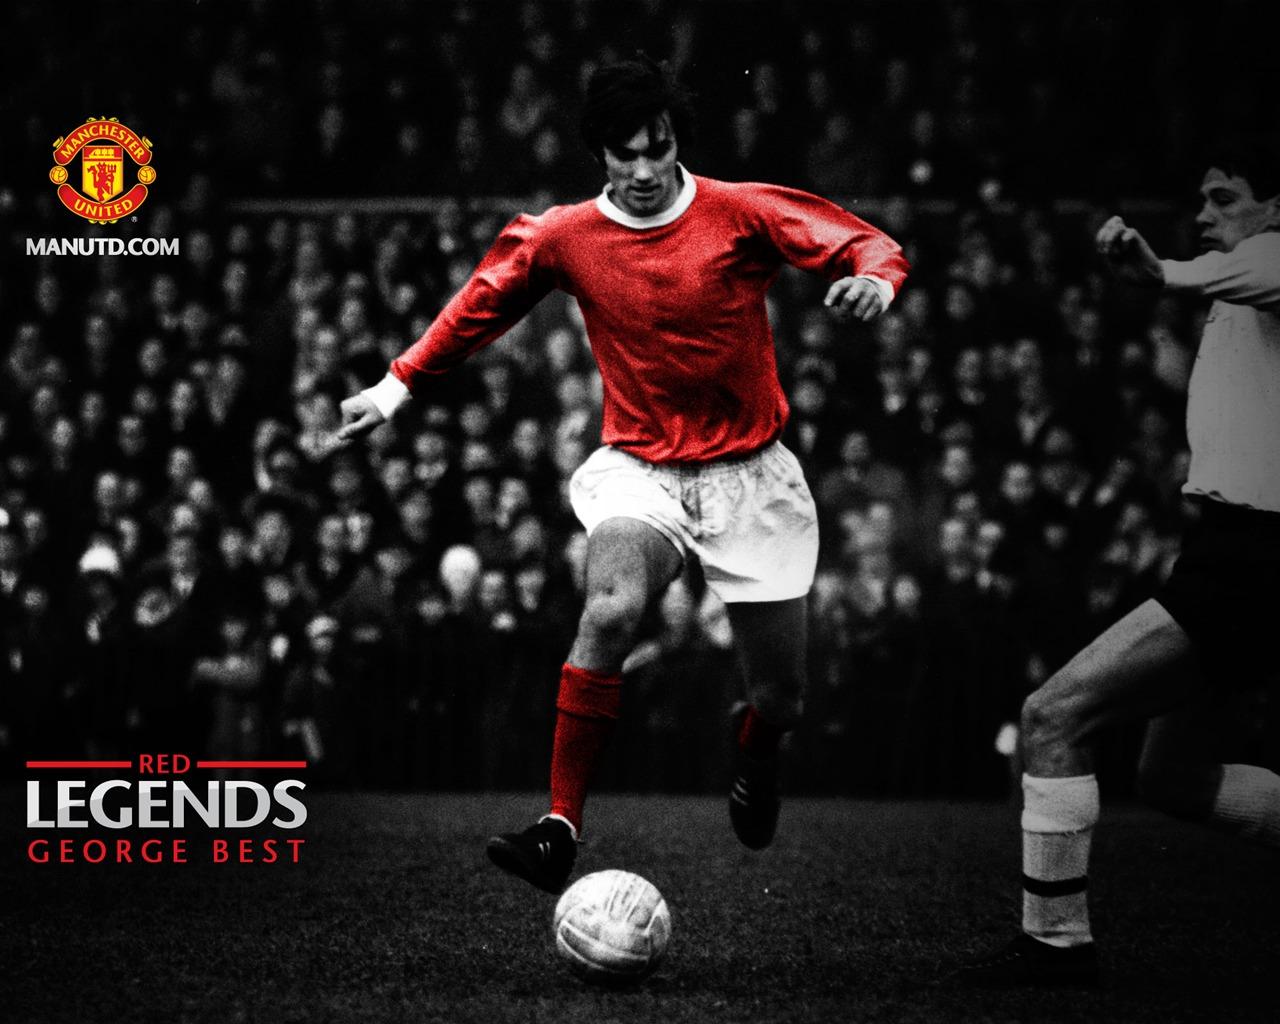 George Best Red Legends Manchester United Wallpaper